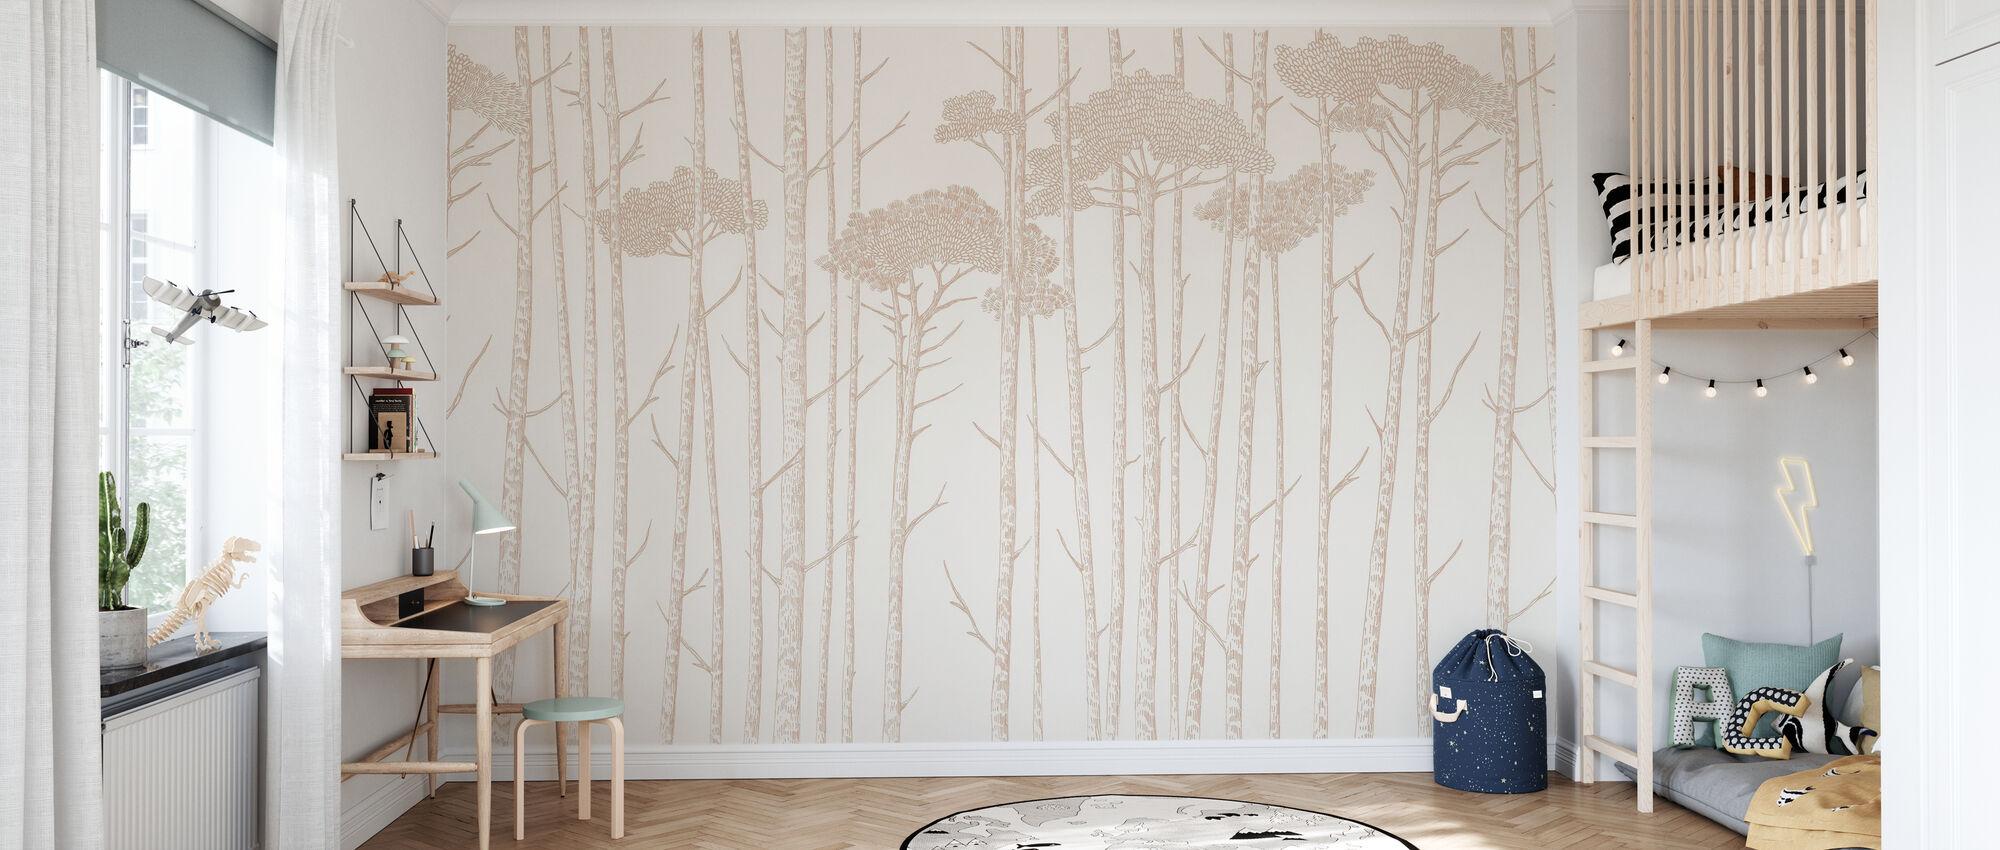 Tree Tops - Blush - Wallpaper - Kids Room